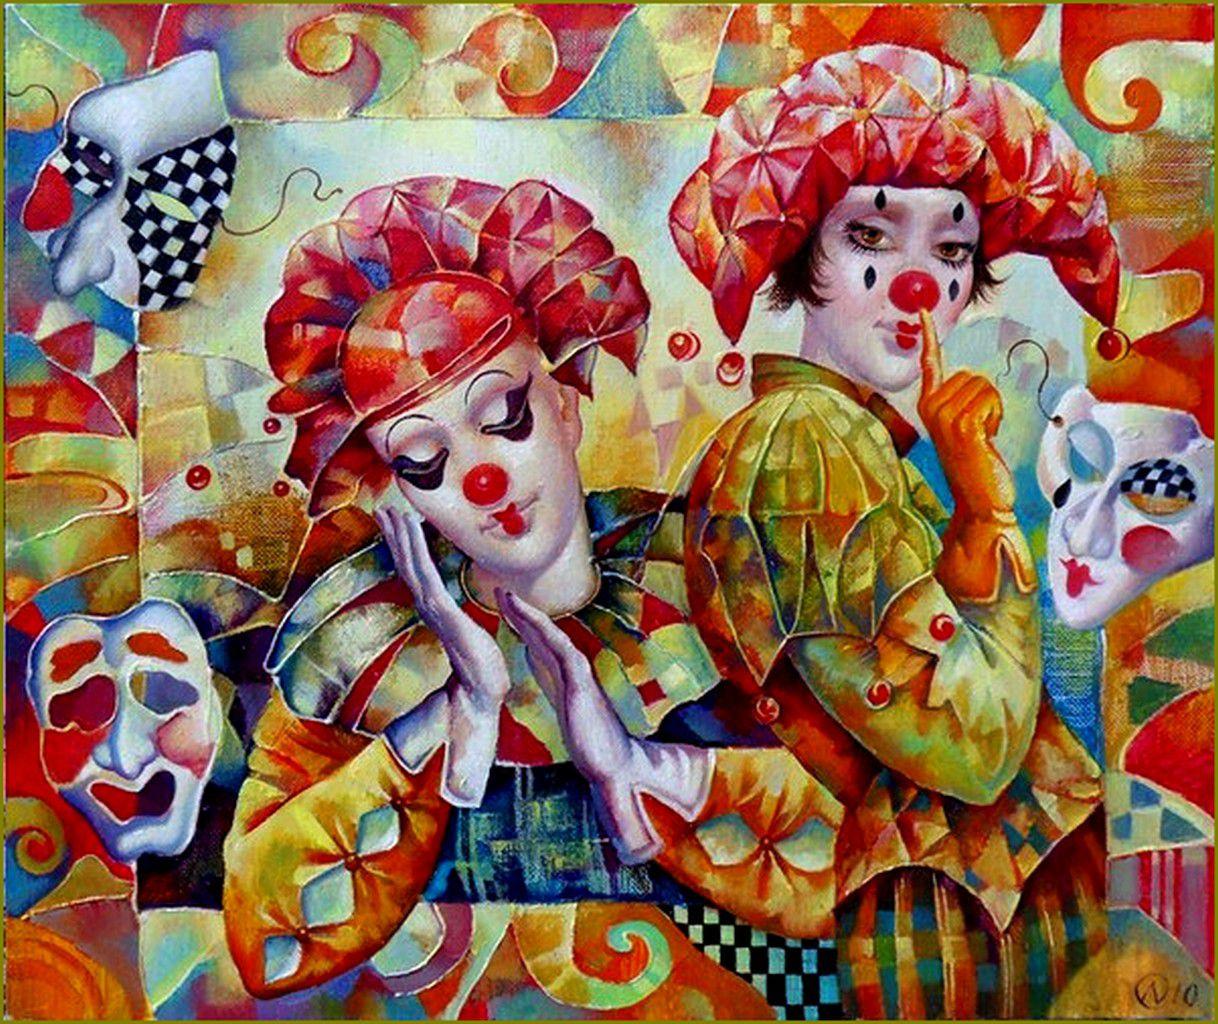 Masques - Carnaval - mardi-graspar les grands peintres-  Olga Naletova